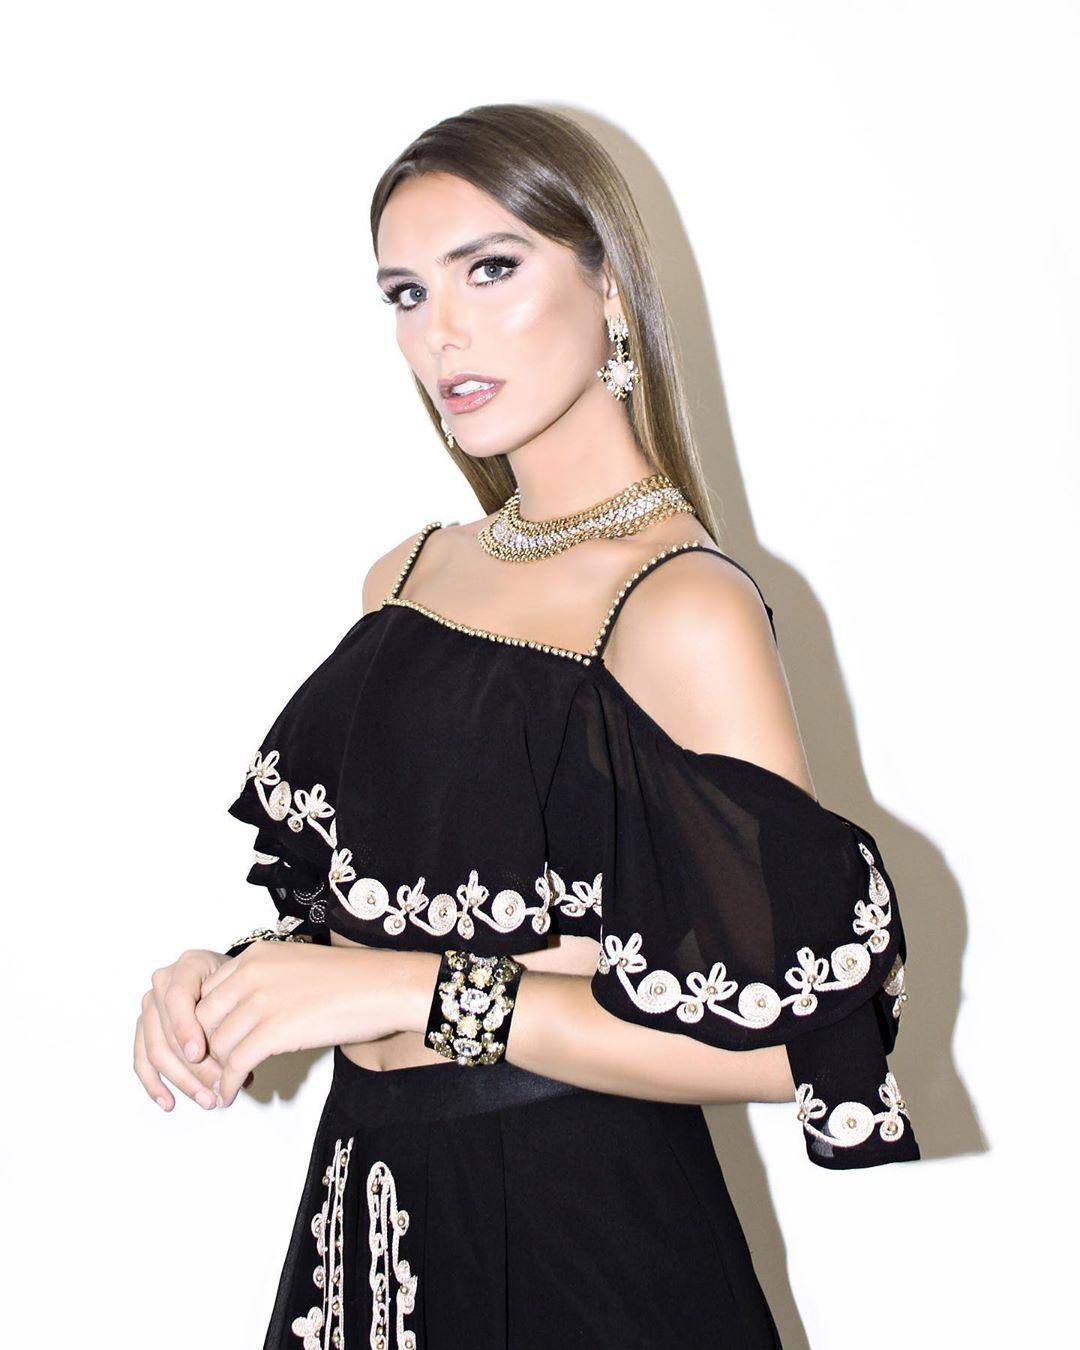 angela ponce, miss espana universo 2018. - Página 20 75538120